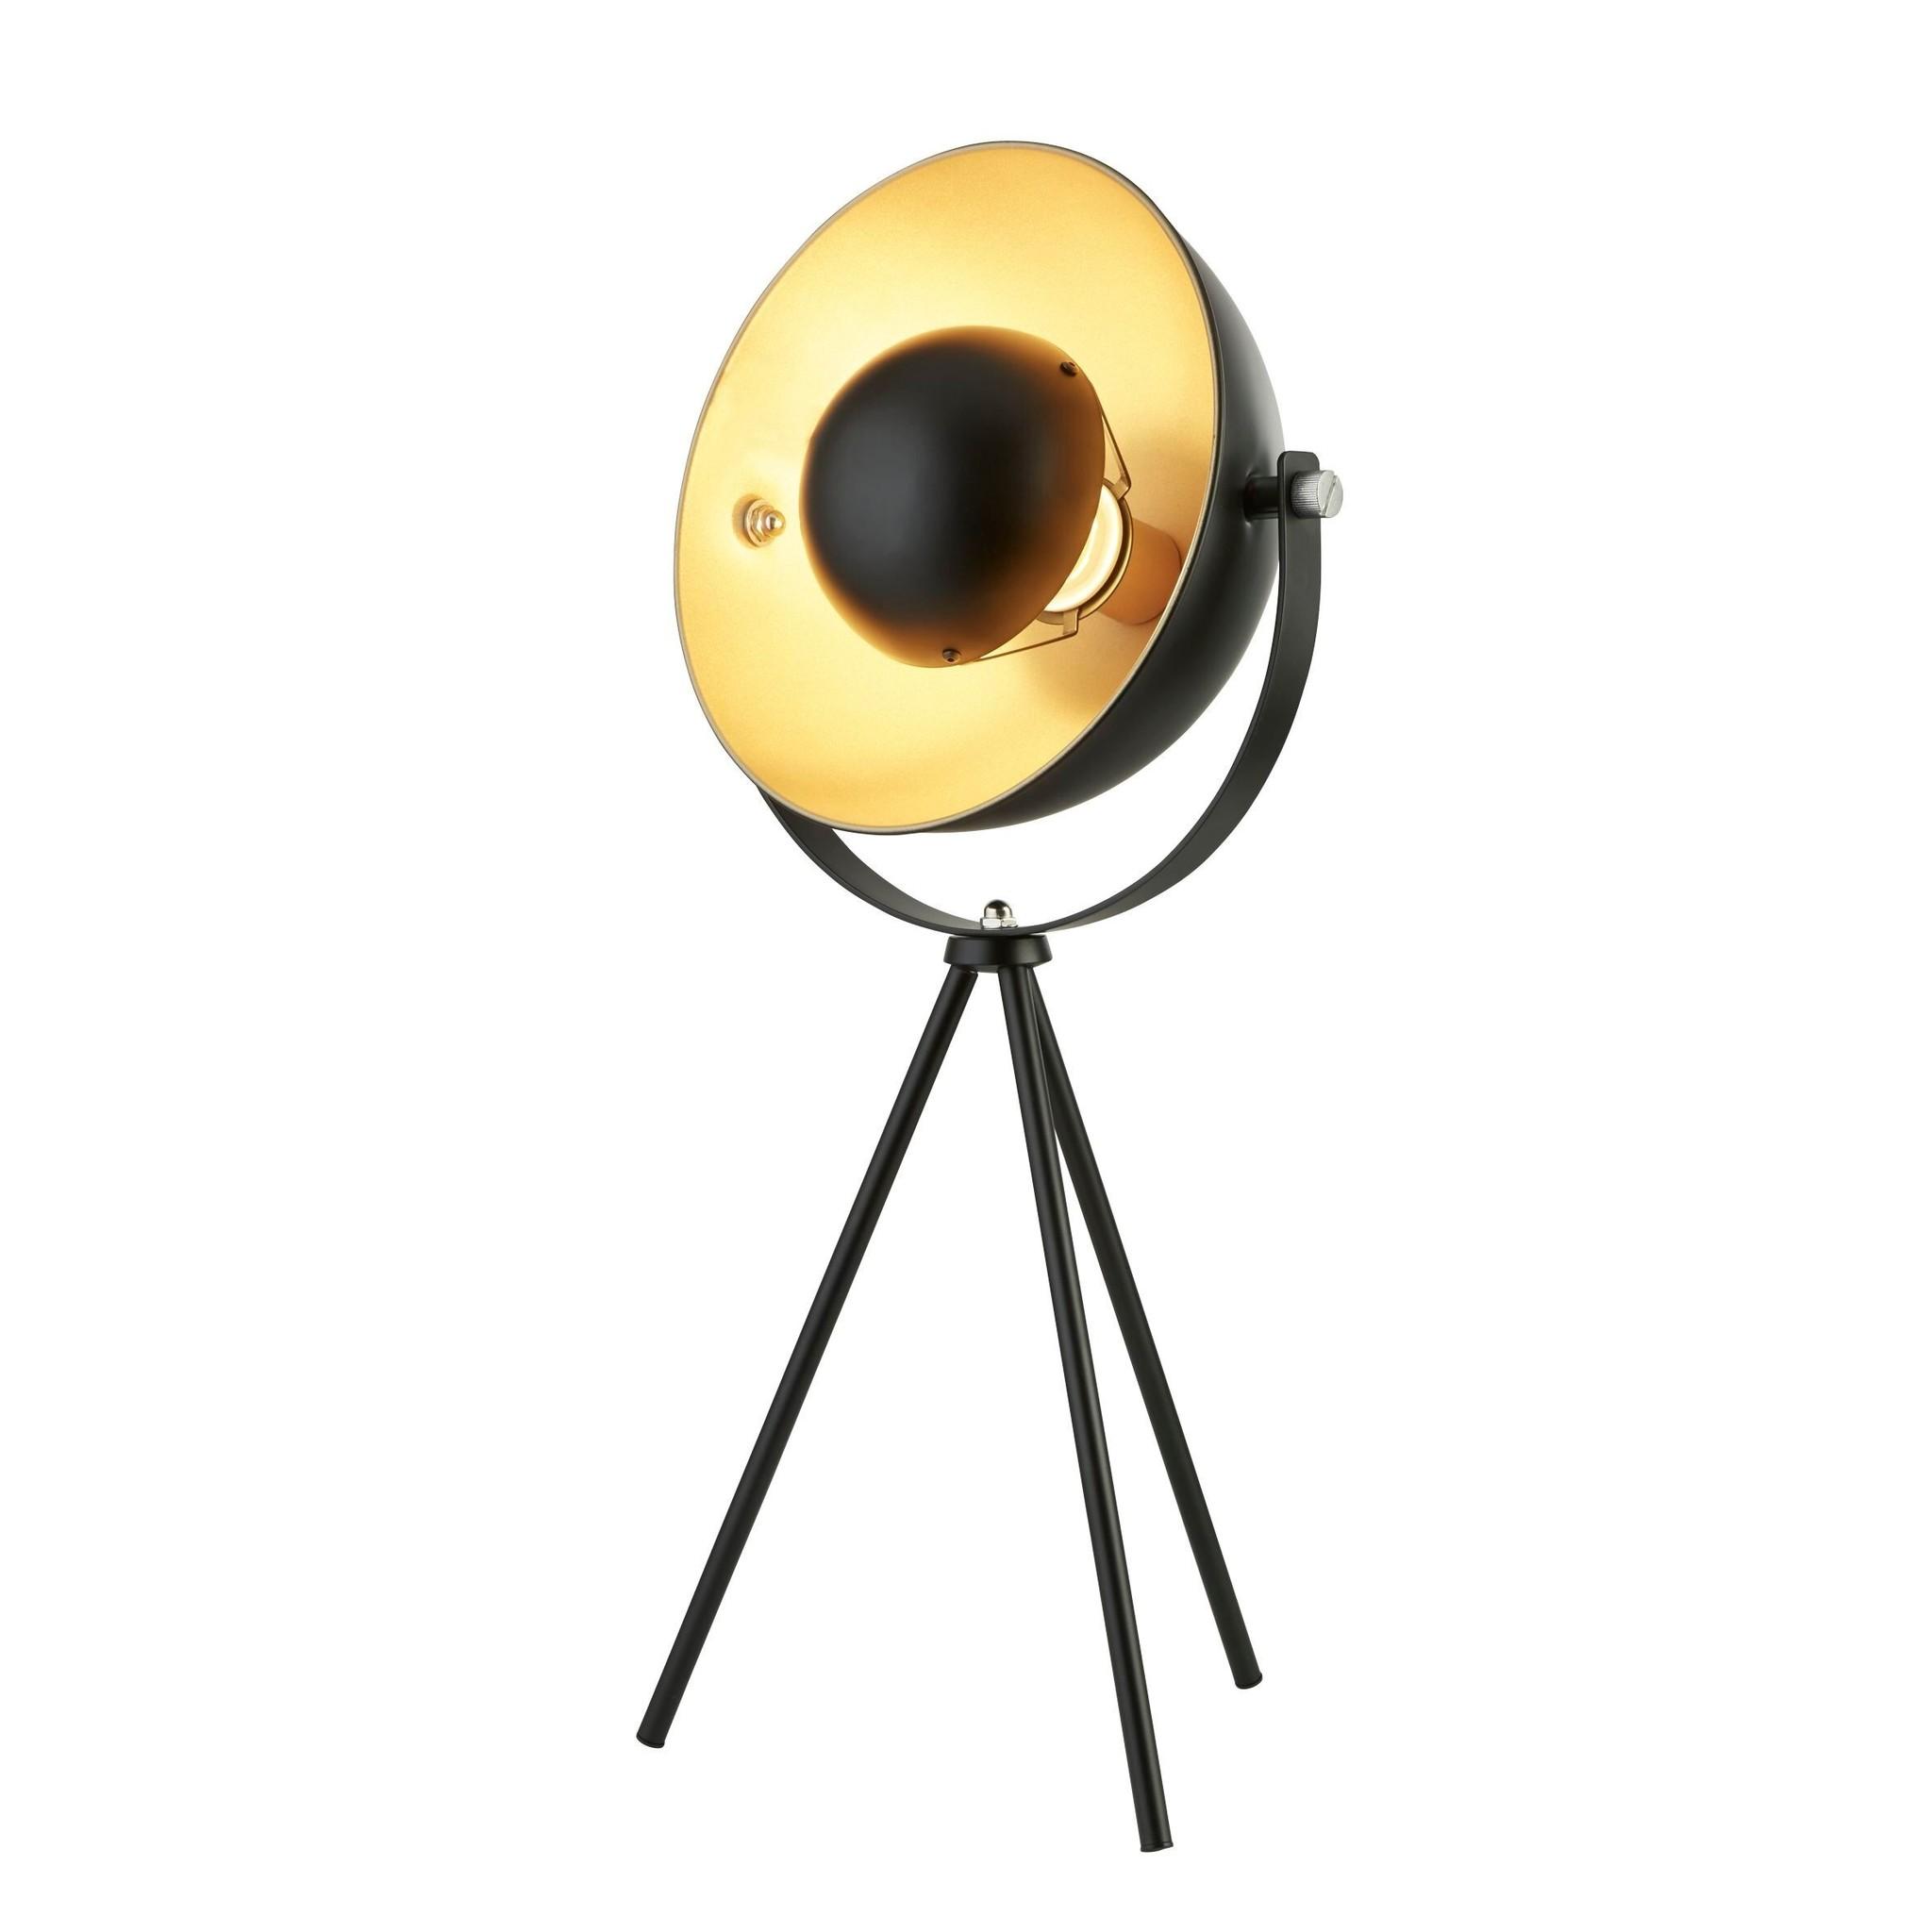 Image of: Loft Modern Tripod Table Lamp Black Gold Lightbox